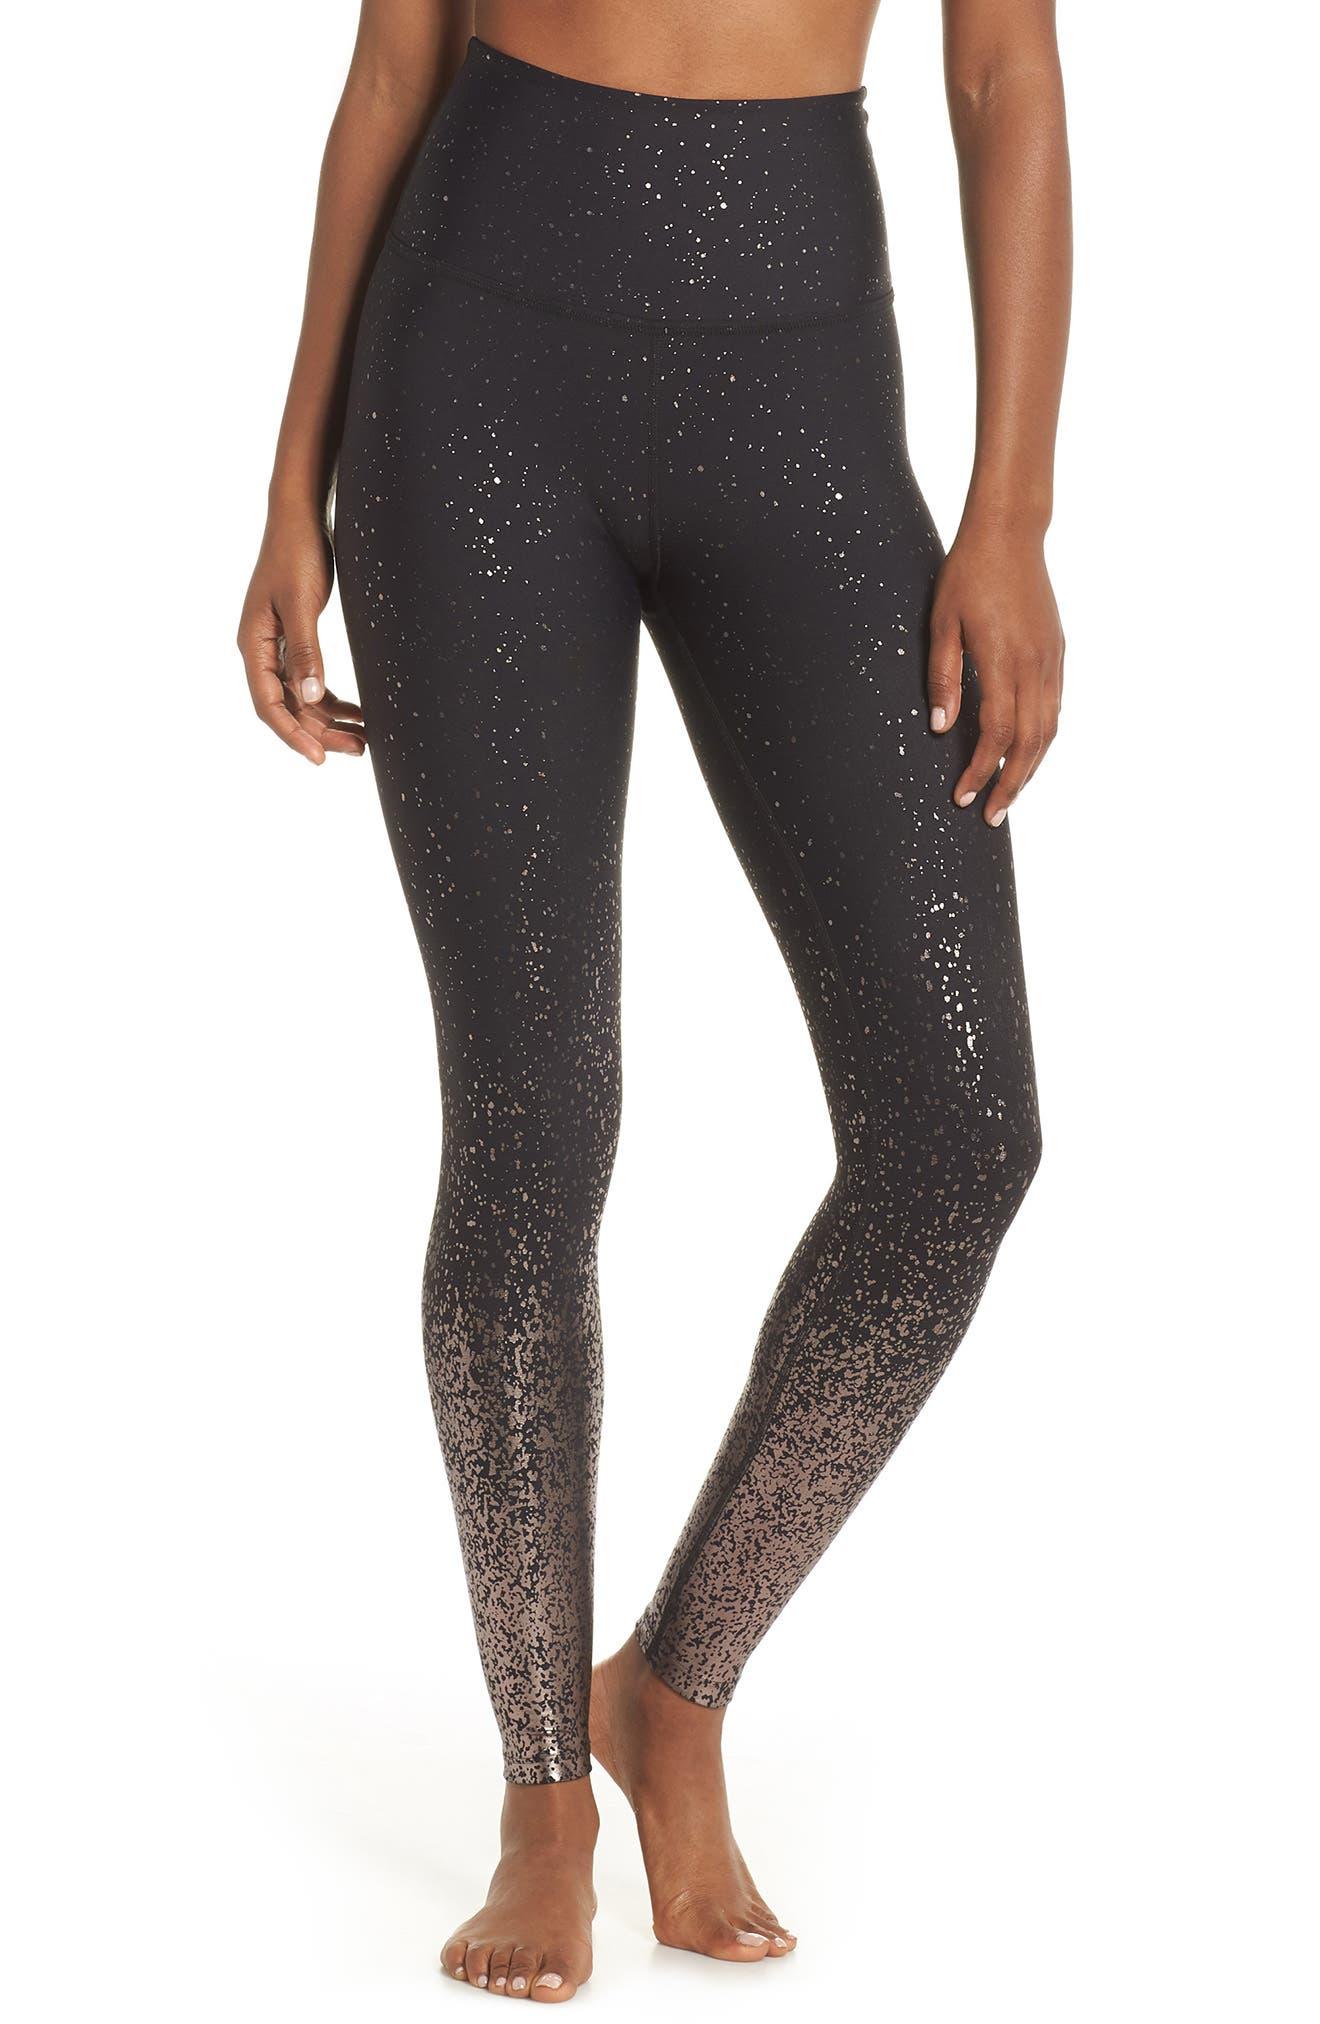 Ombré High Waist Leggings,                         Main,                         color, BLACK GUNMETAL SPECKLE